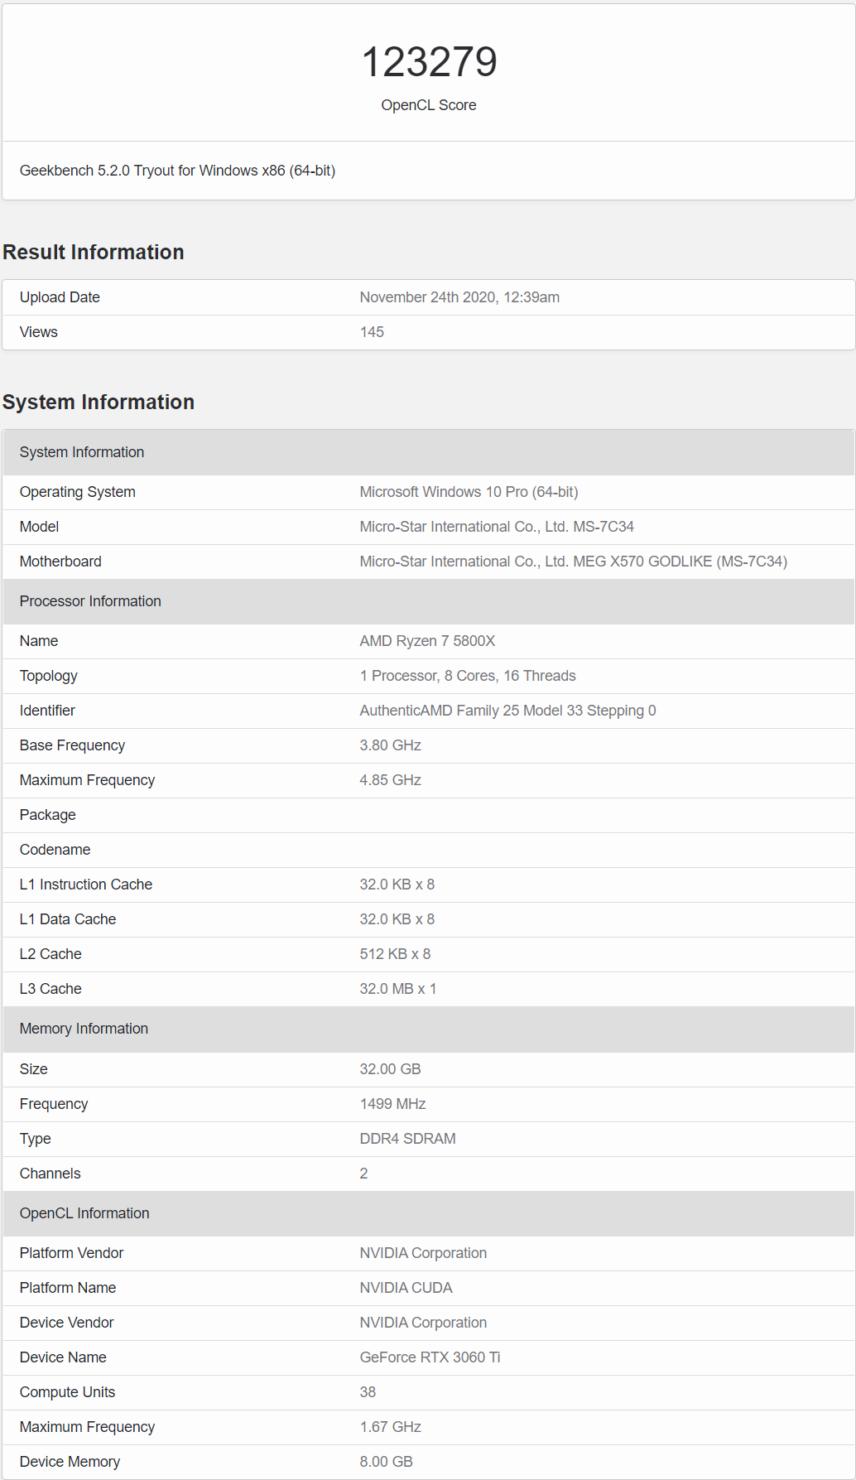 nvidia-geforce-rtx-3060-ti-geekbench-leaked-benchmarks_1